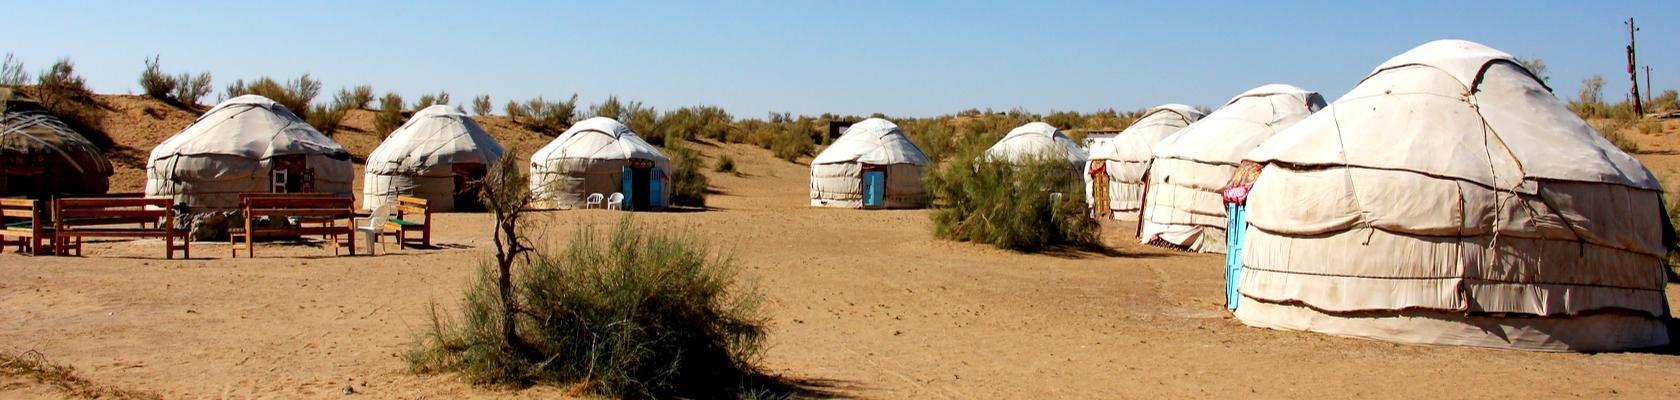 Yurts, Kyzylkum Woestijn